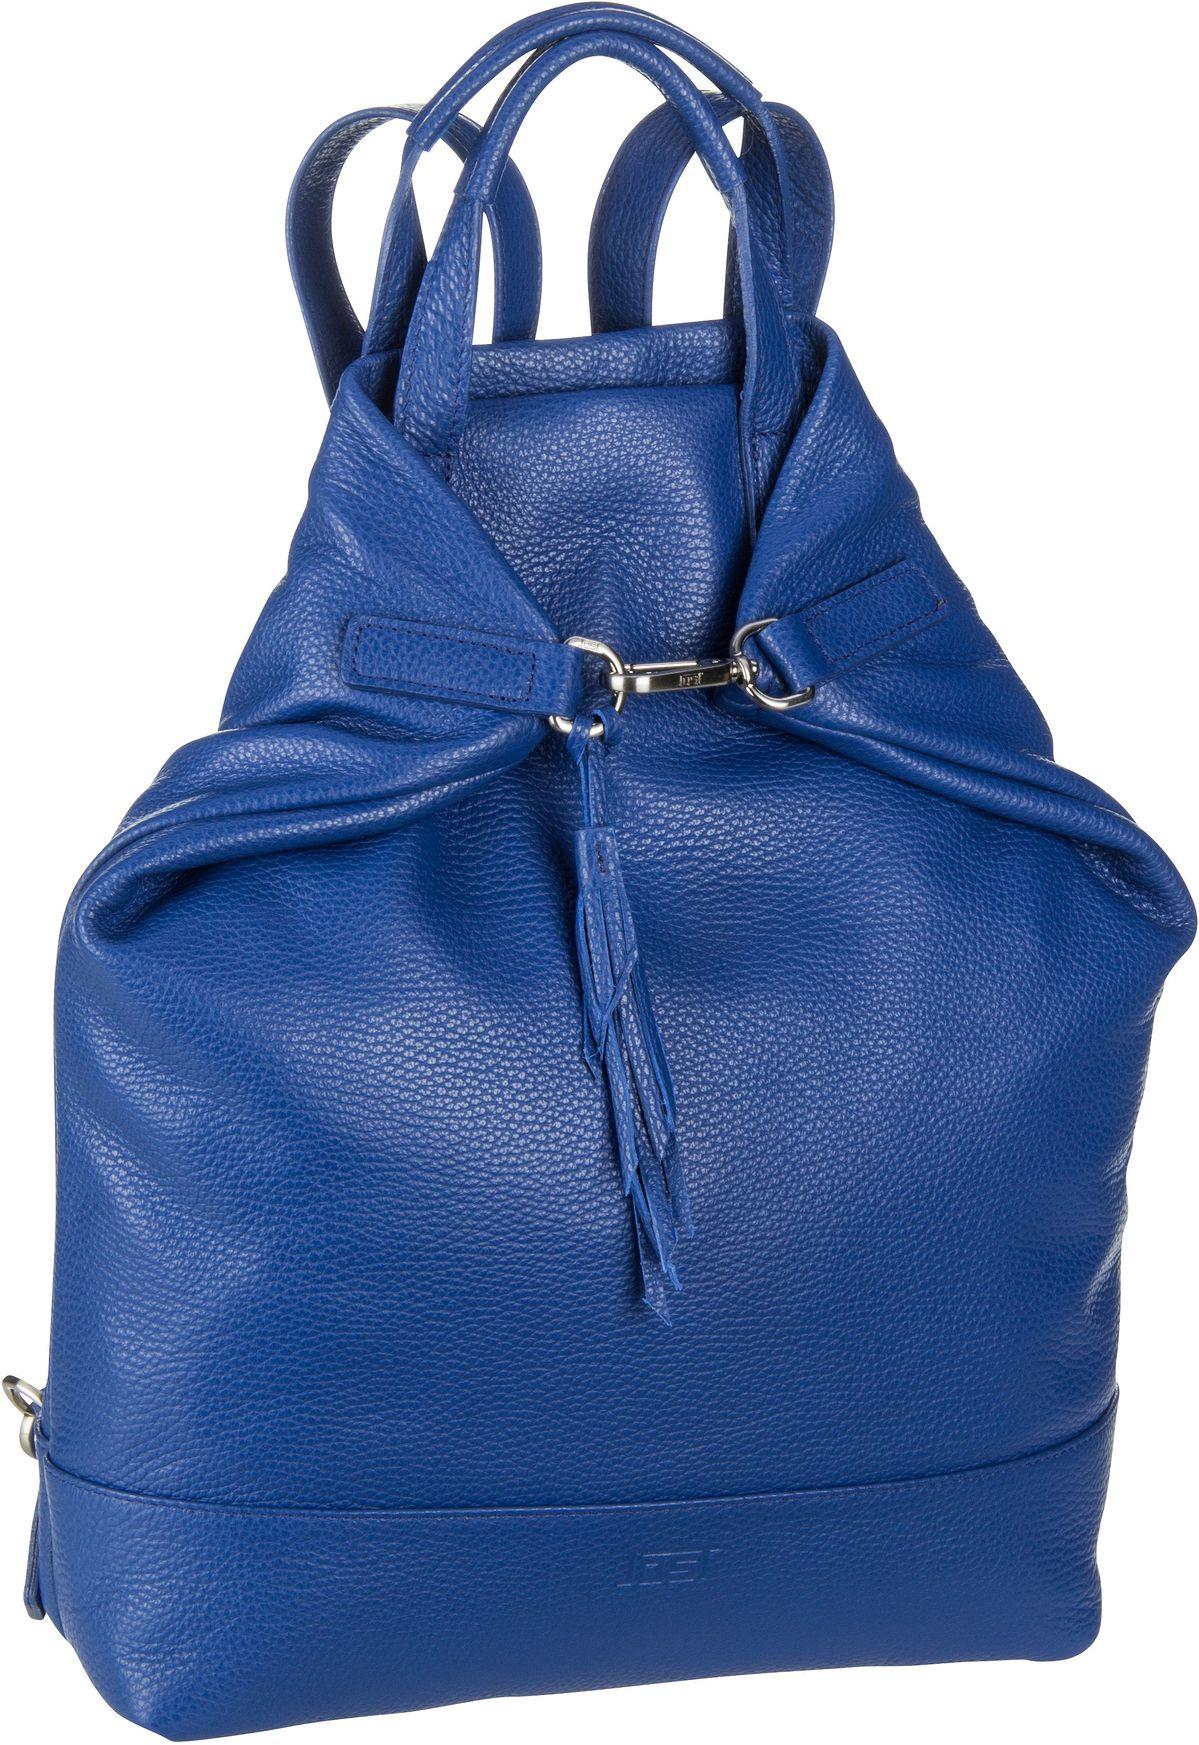 Rucksack / Daypack Vika 1910 X-Change Bag S Royalblue